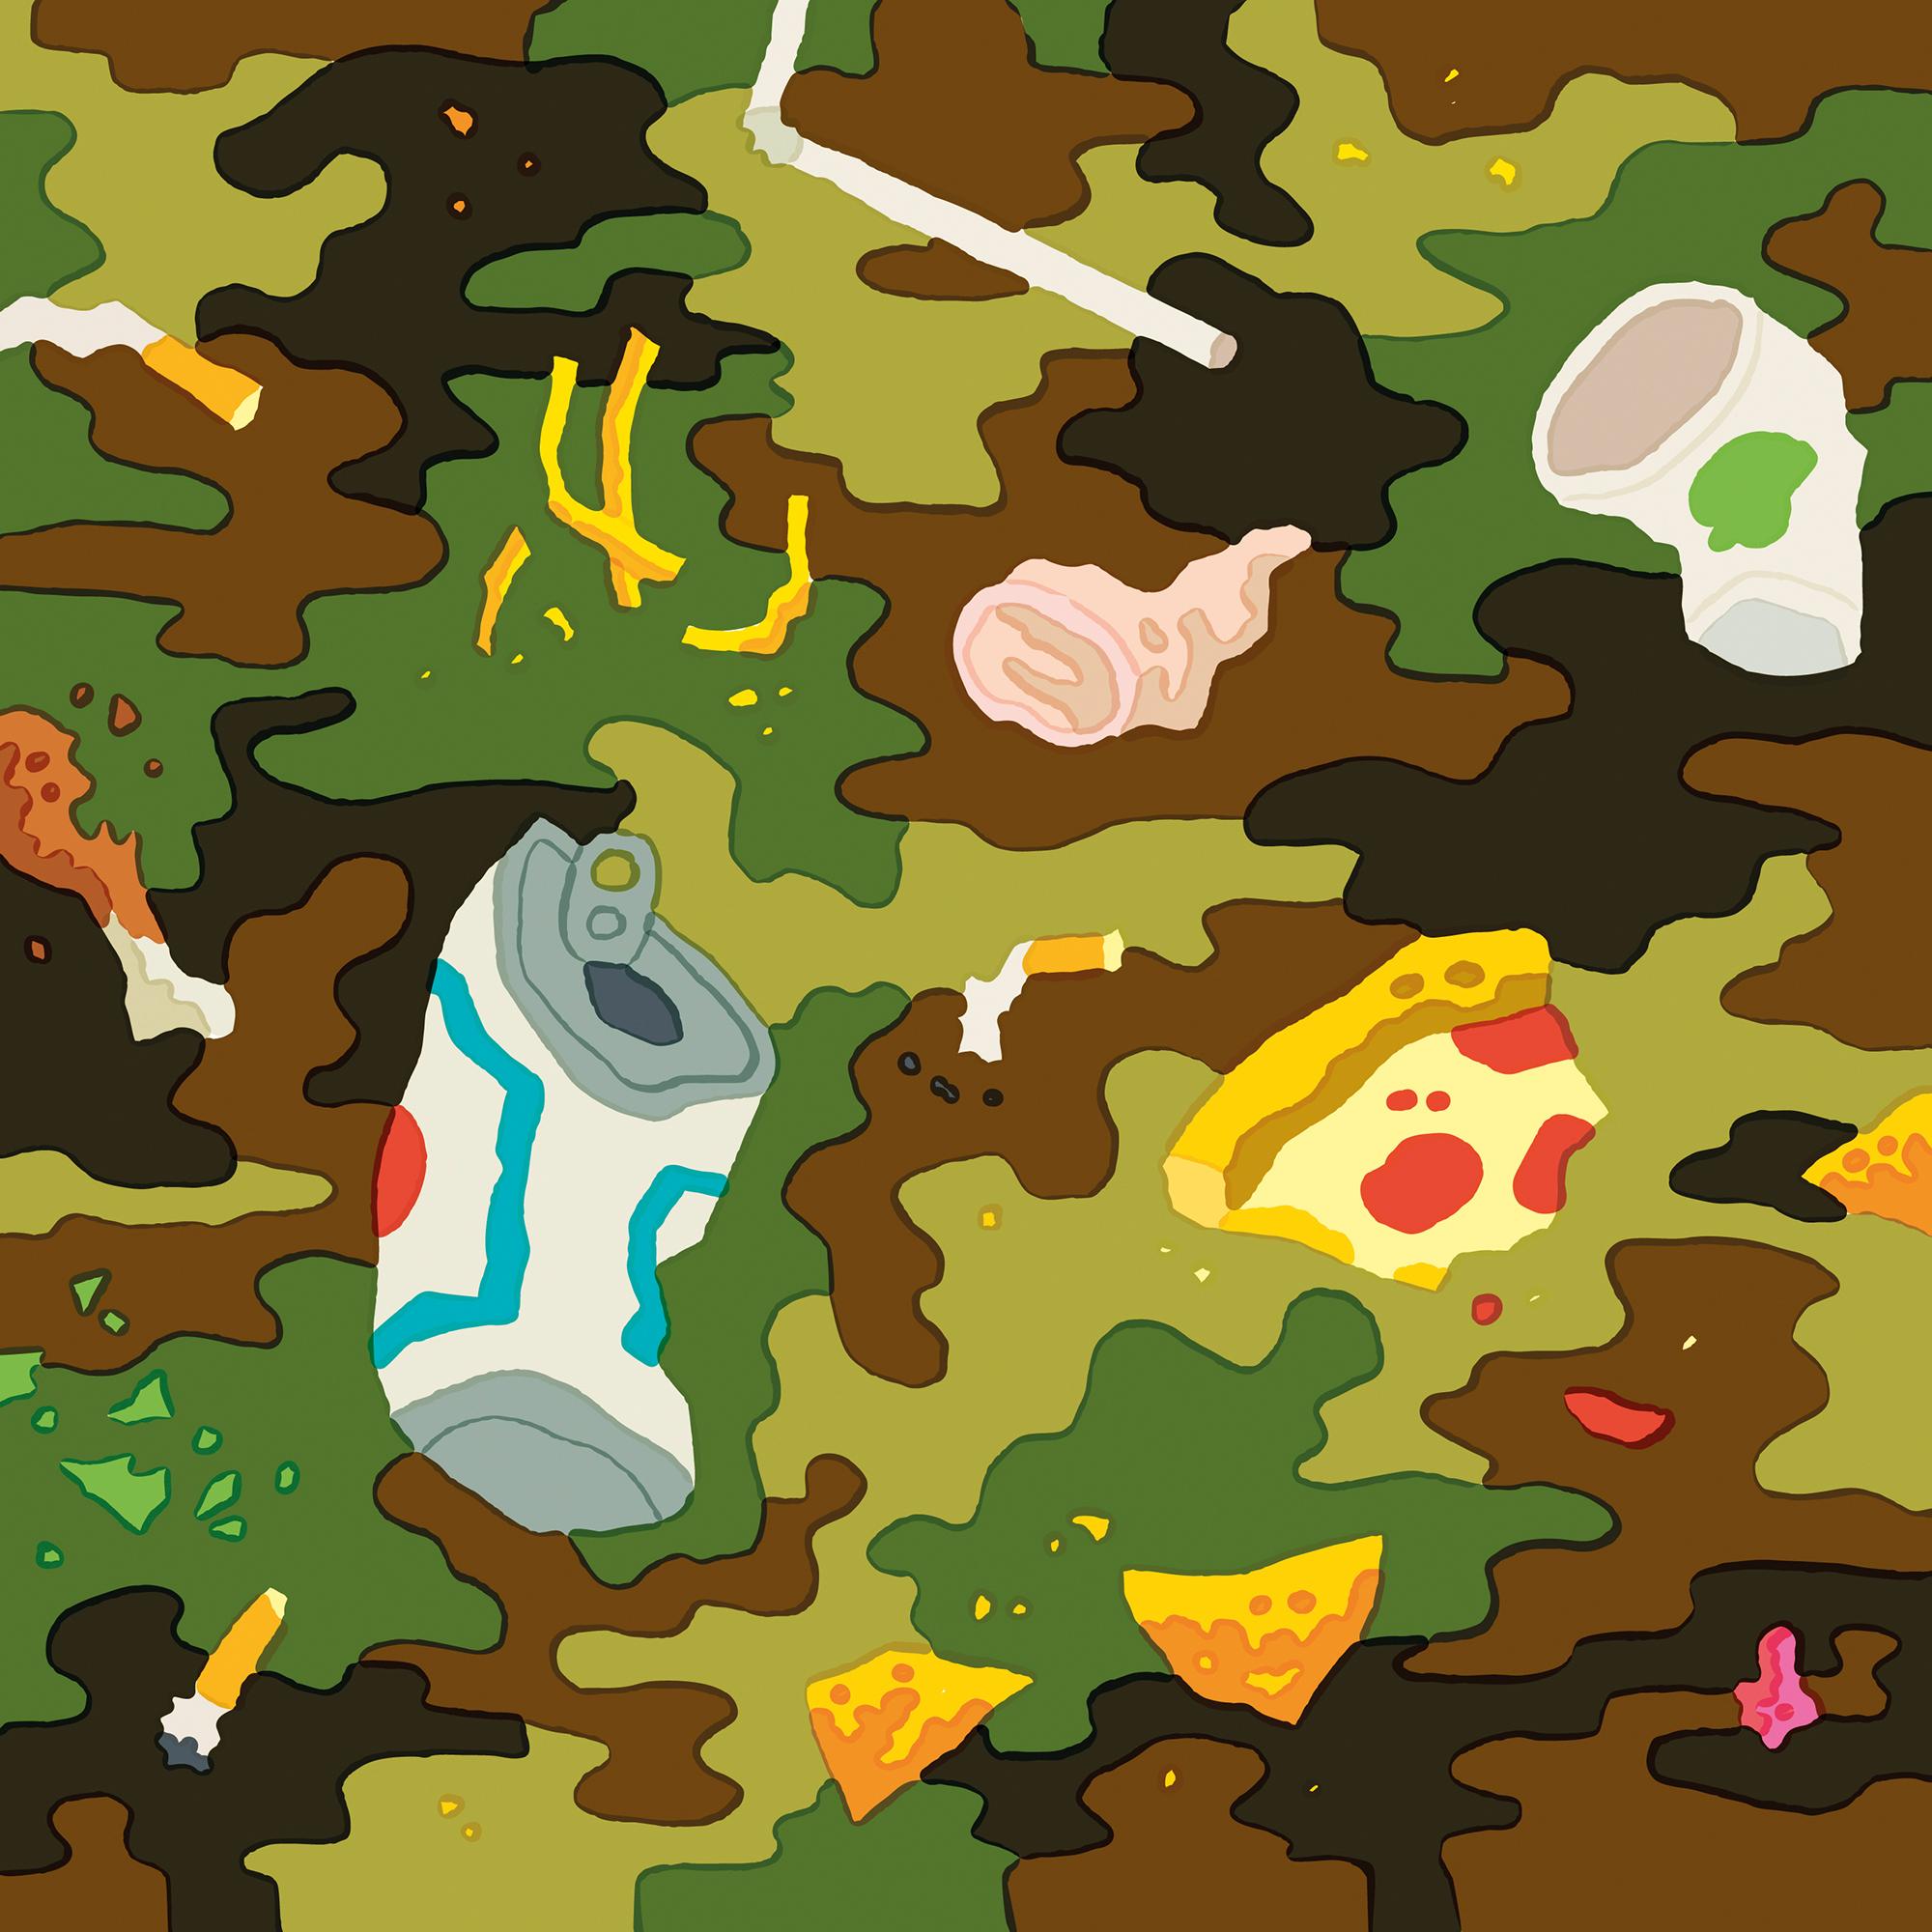 Urban Camouflage by Tim Lahan | Agent Pekka